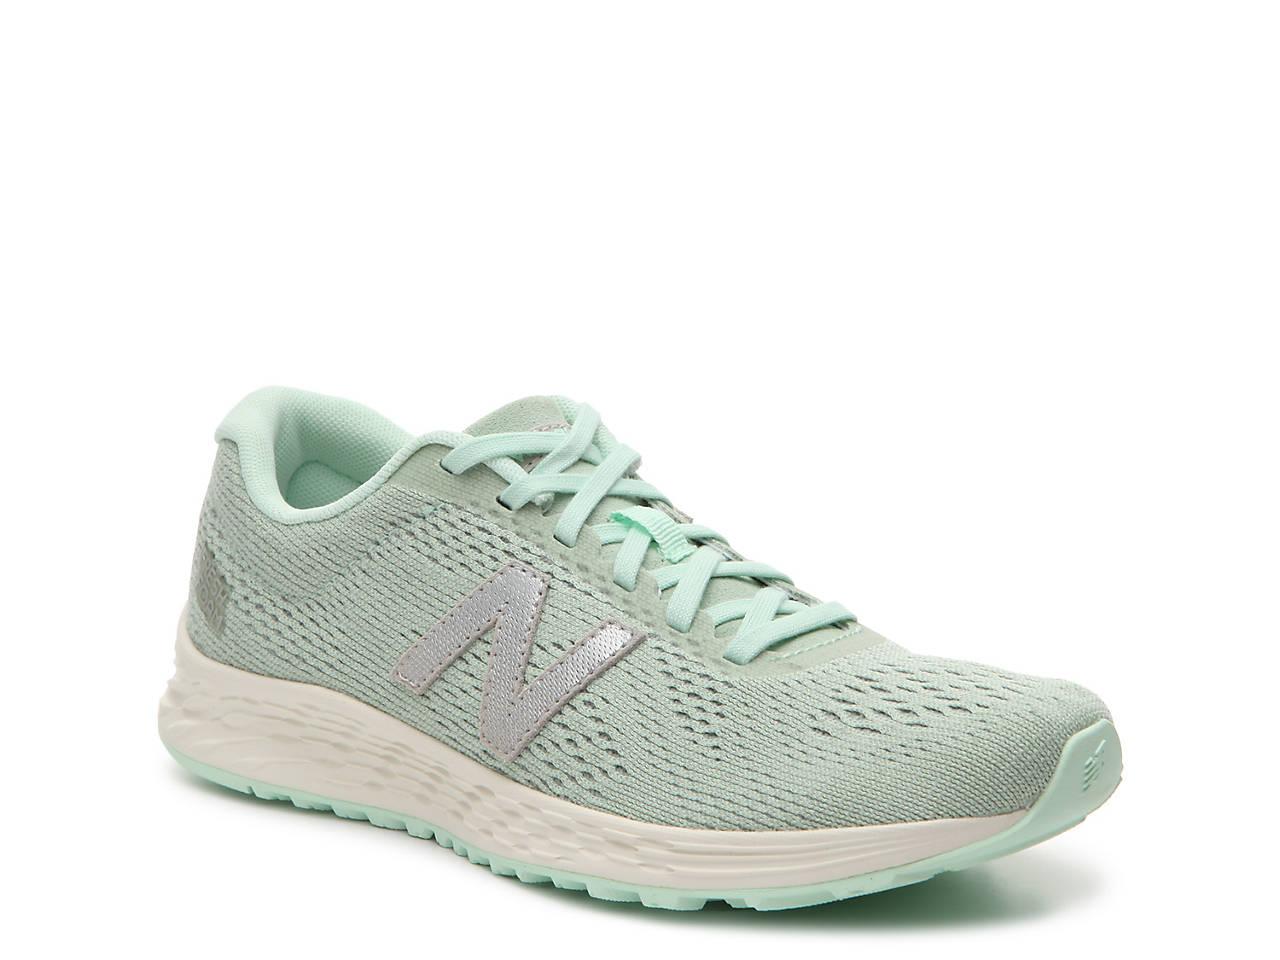 458d1516f New Balance Fresh Foam Arishi Lightweight Running Shoe - Women's ...